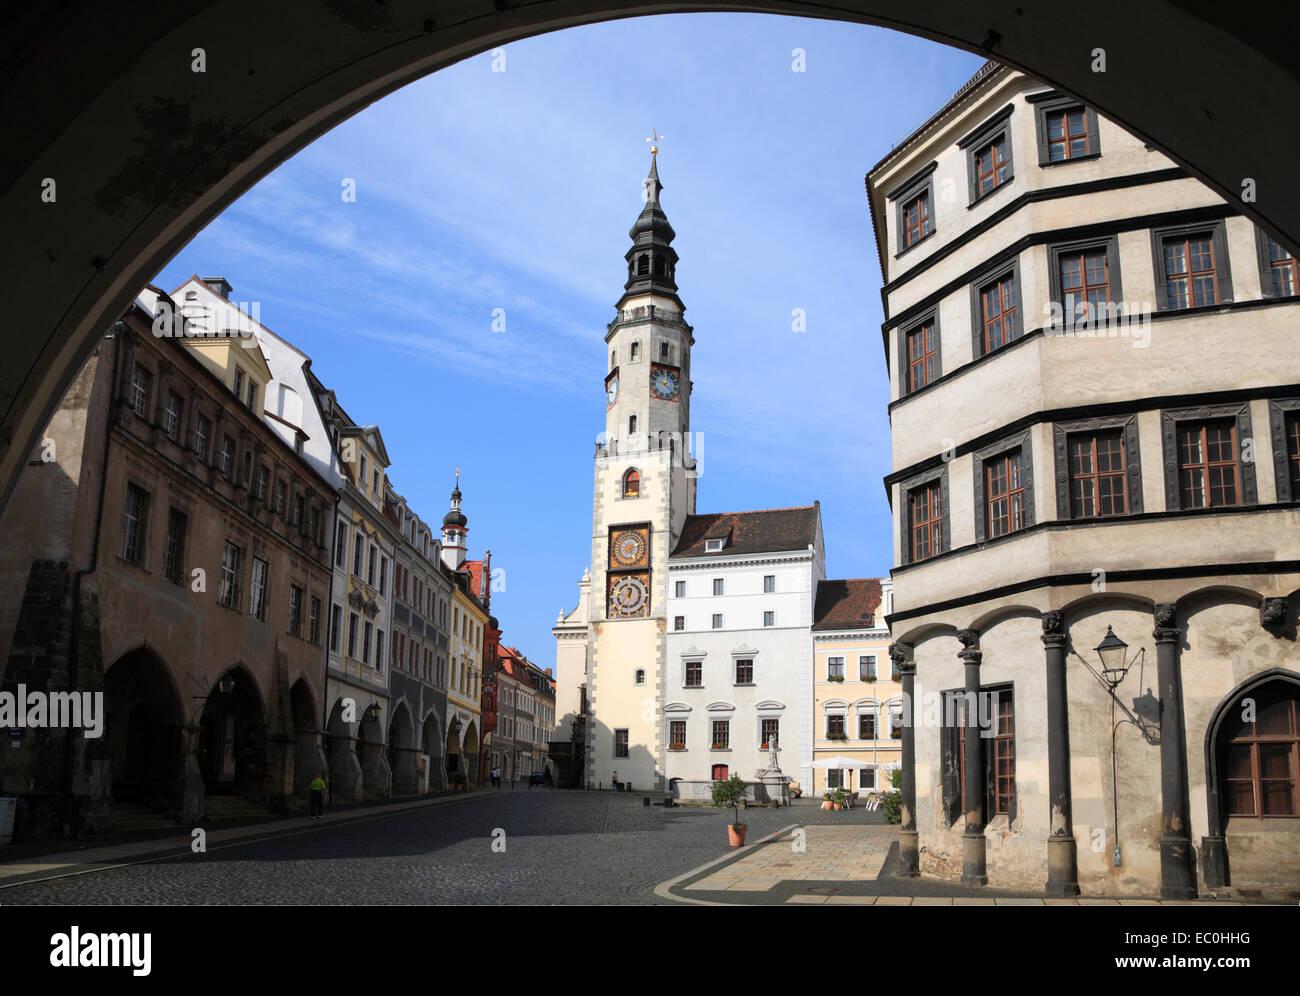 Untermarkt square with town hall clocktower, Goerlitz, Saxony, Germany, Europe - Stock Image